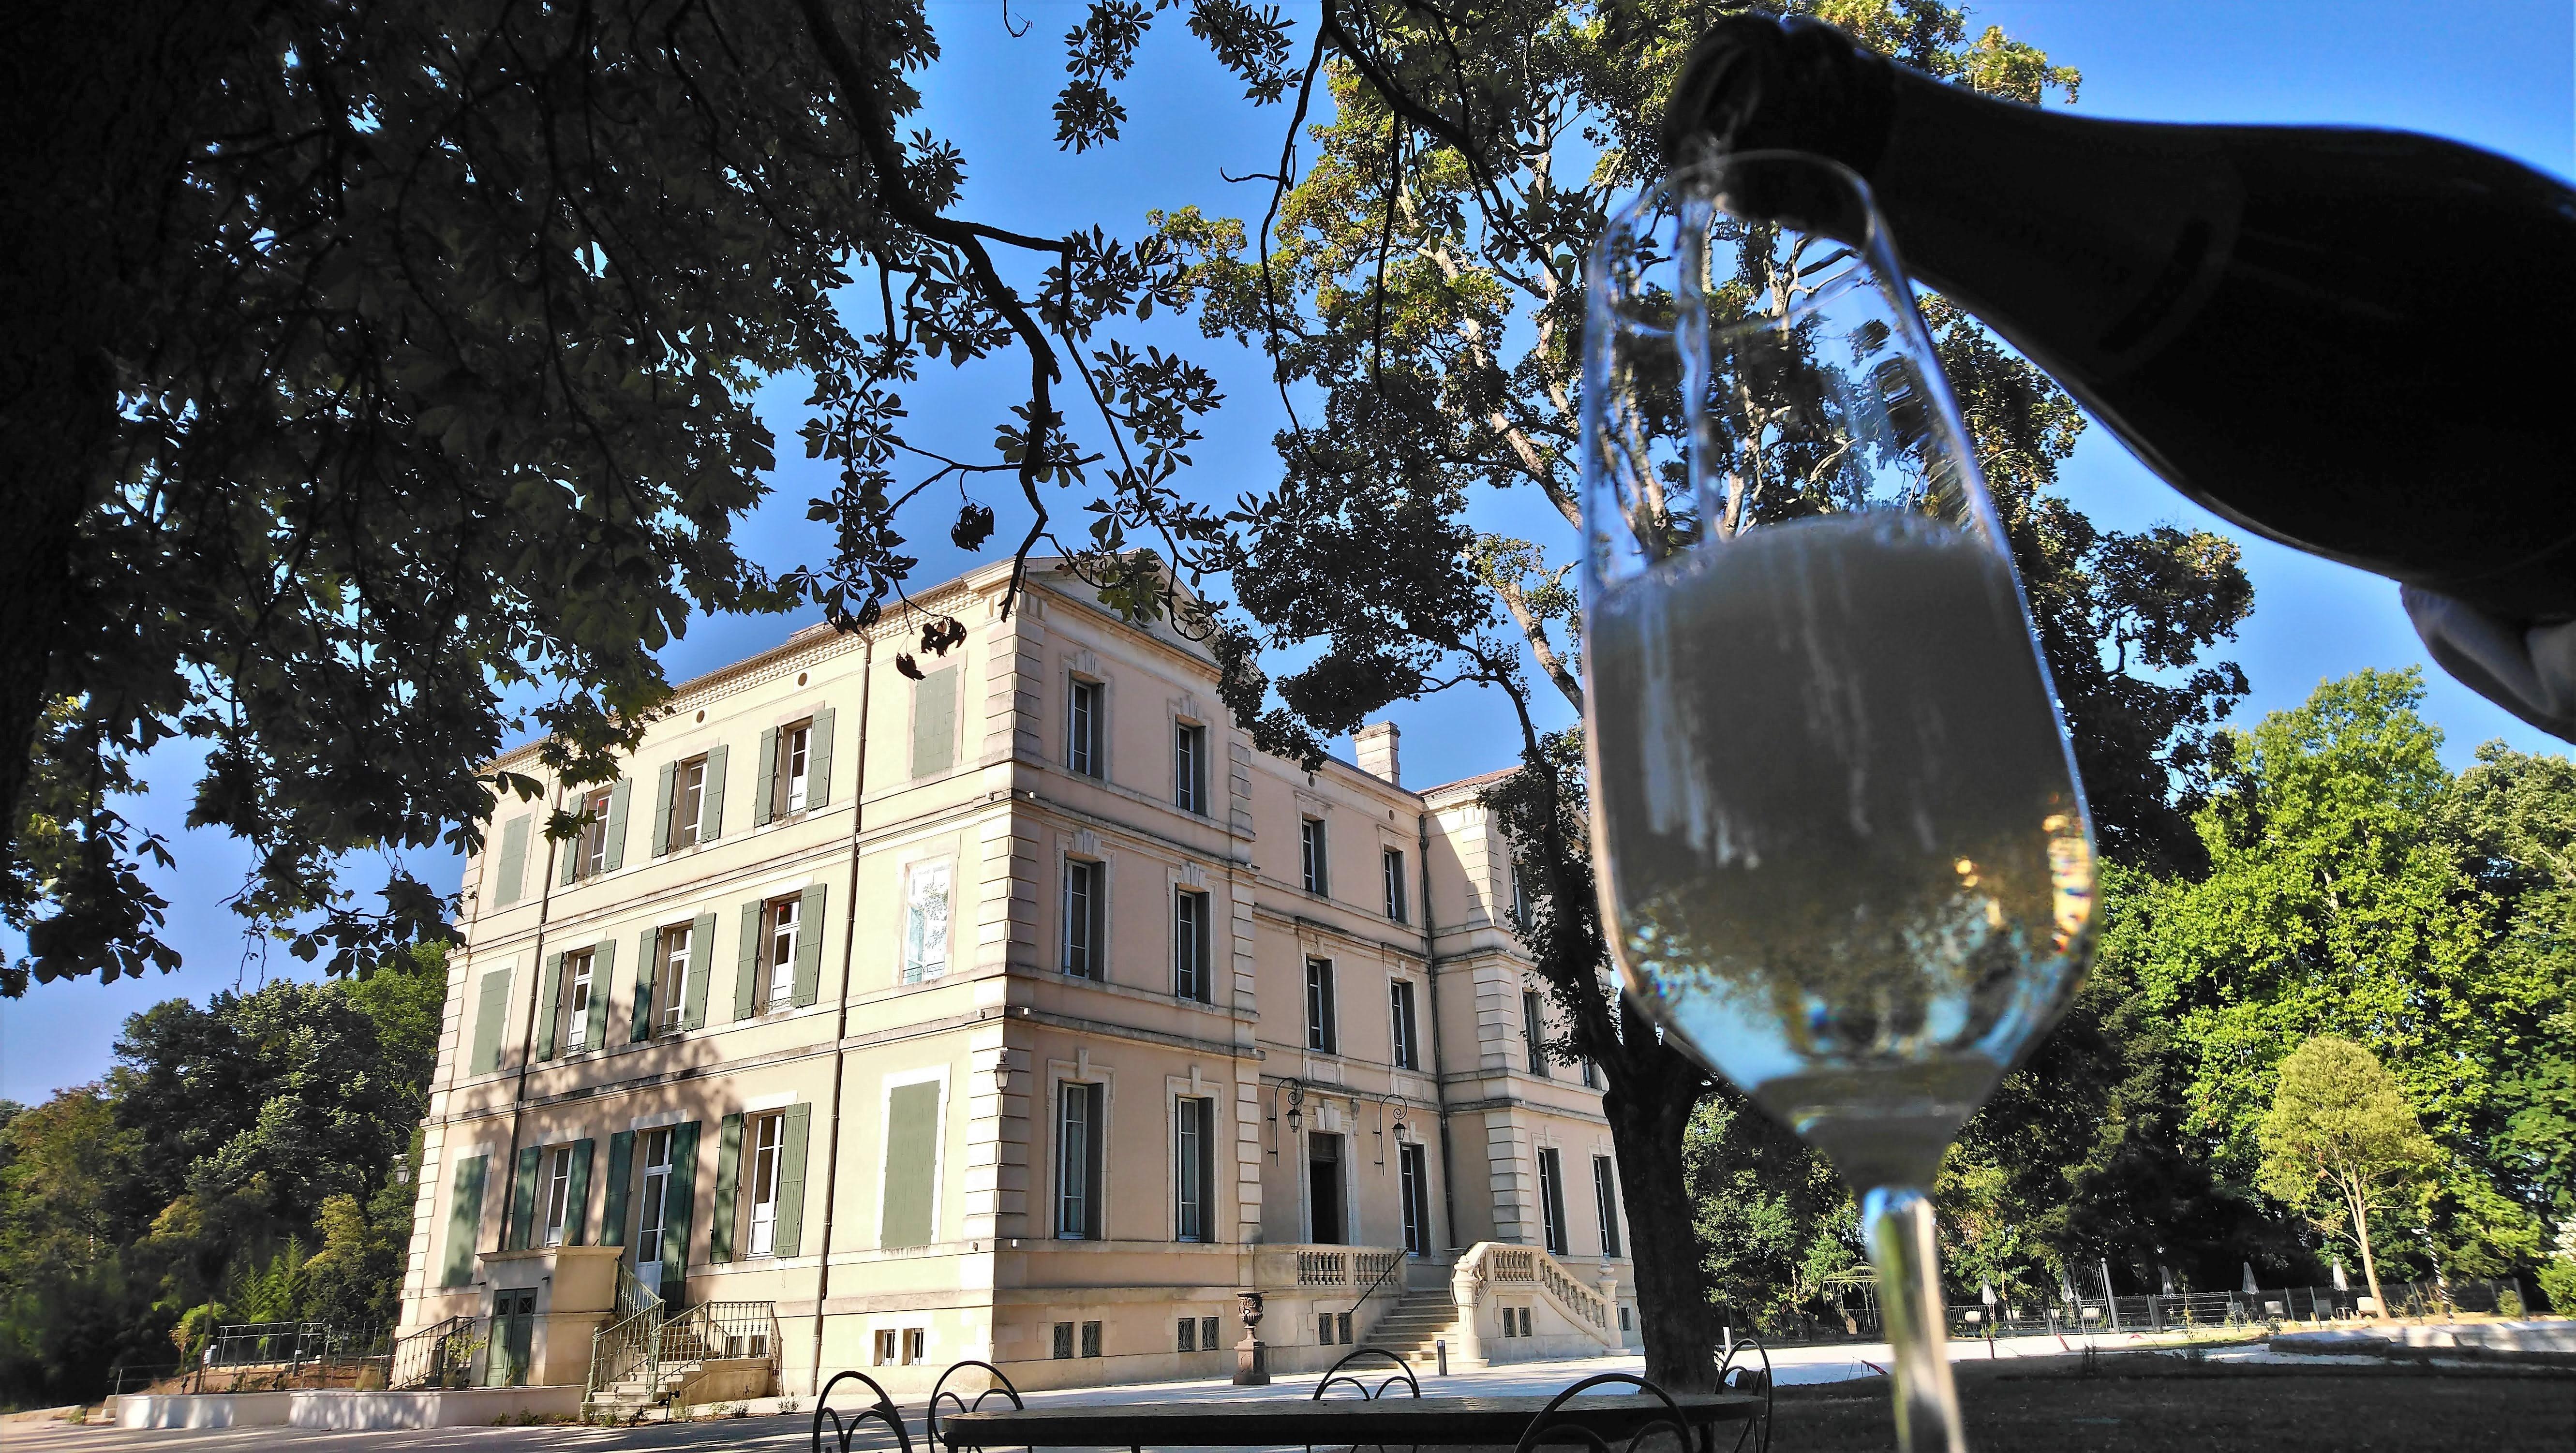 Château de Montcaud, Hotel und Restaurants, Provence, Frankreich